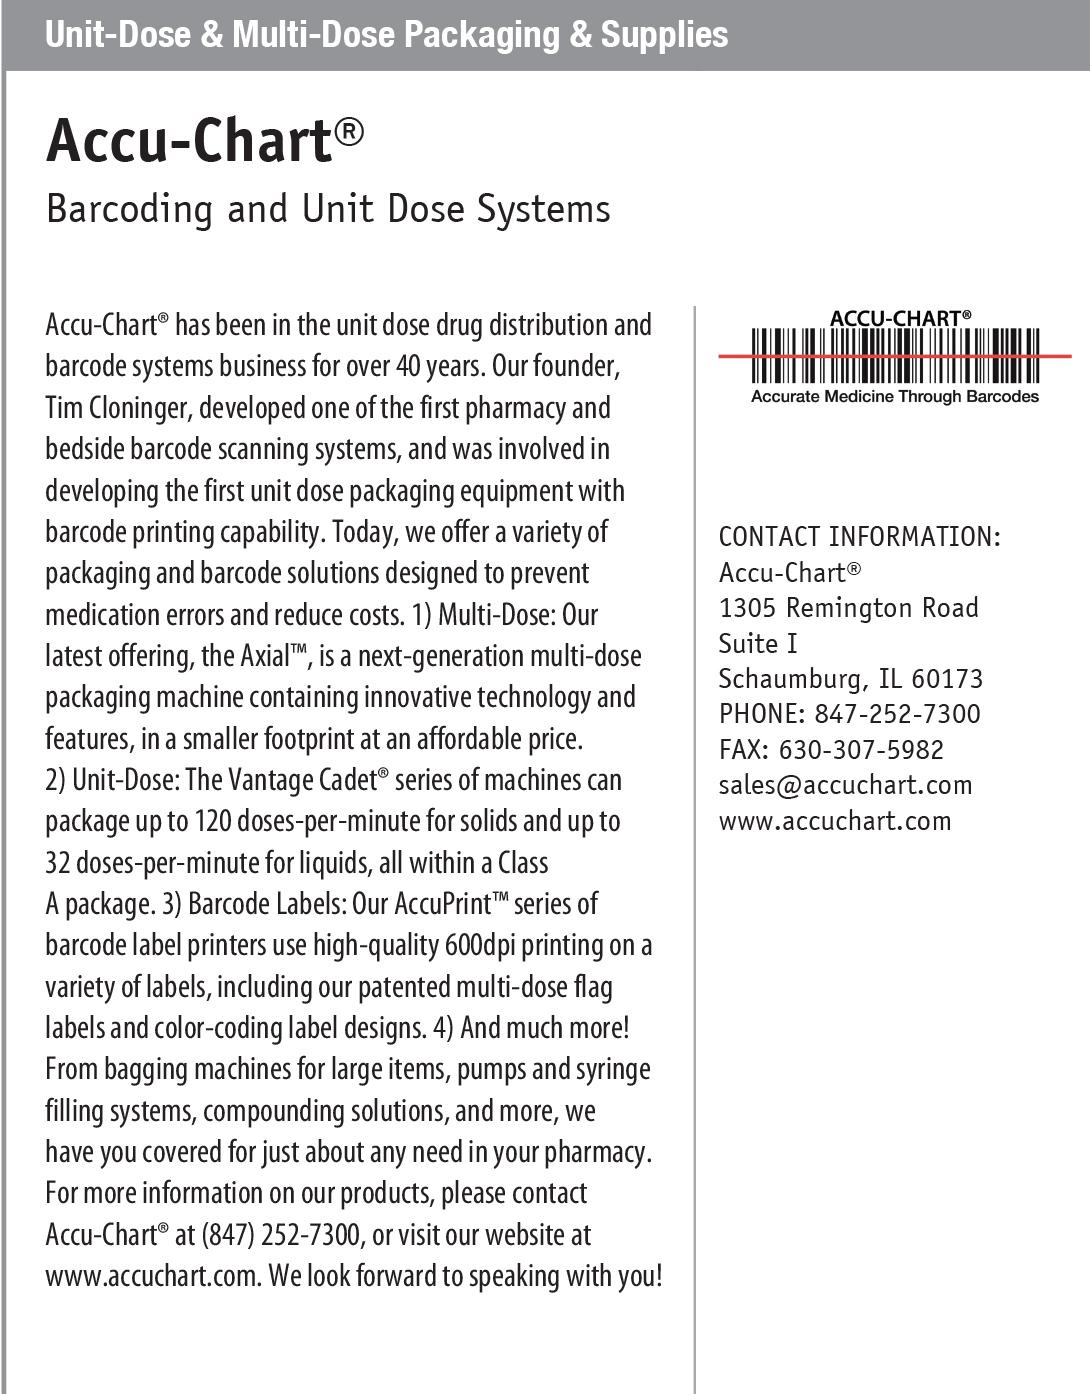 PROFILE_Unit-Dose-_-Multi-Dose-Packaging-_-Supplies---Accu-Chart®.jpg